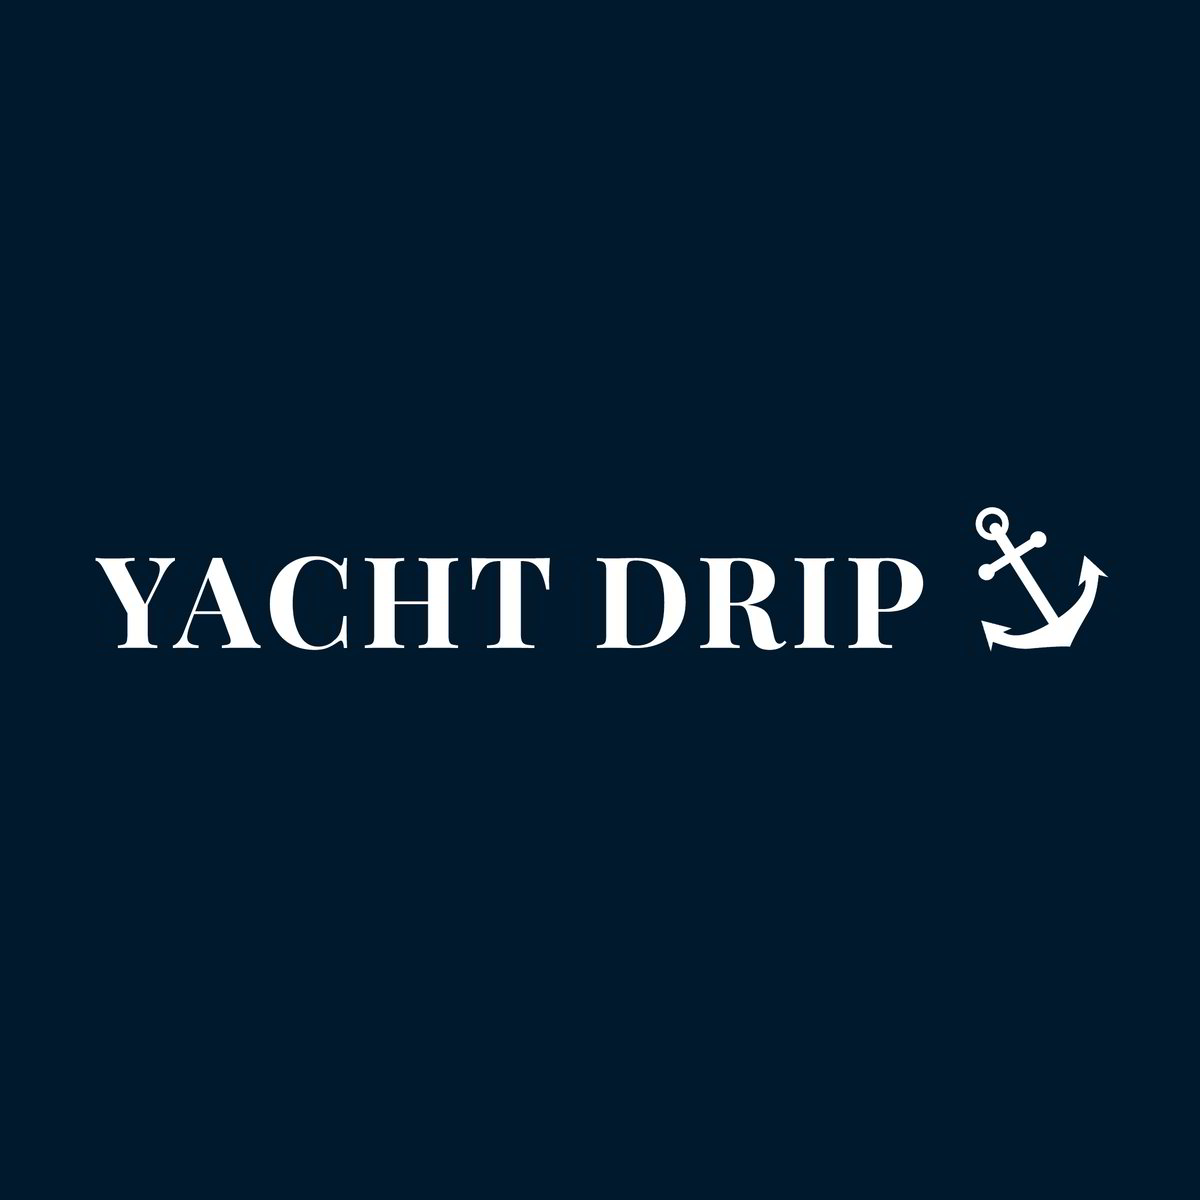 Yacht Drip